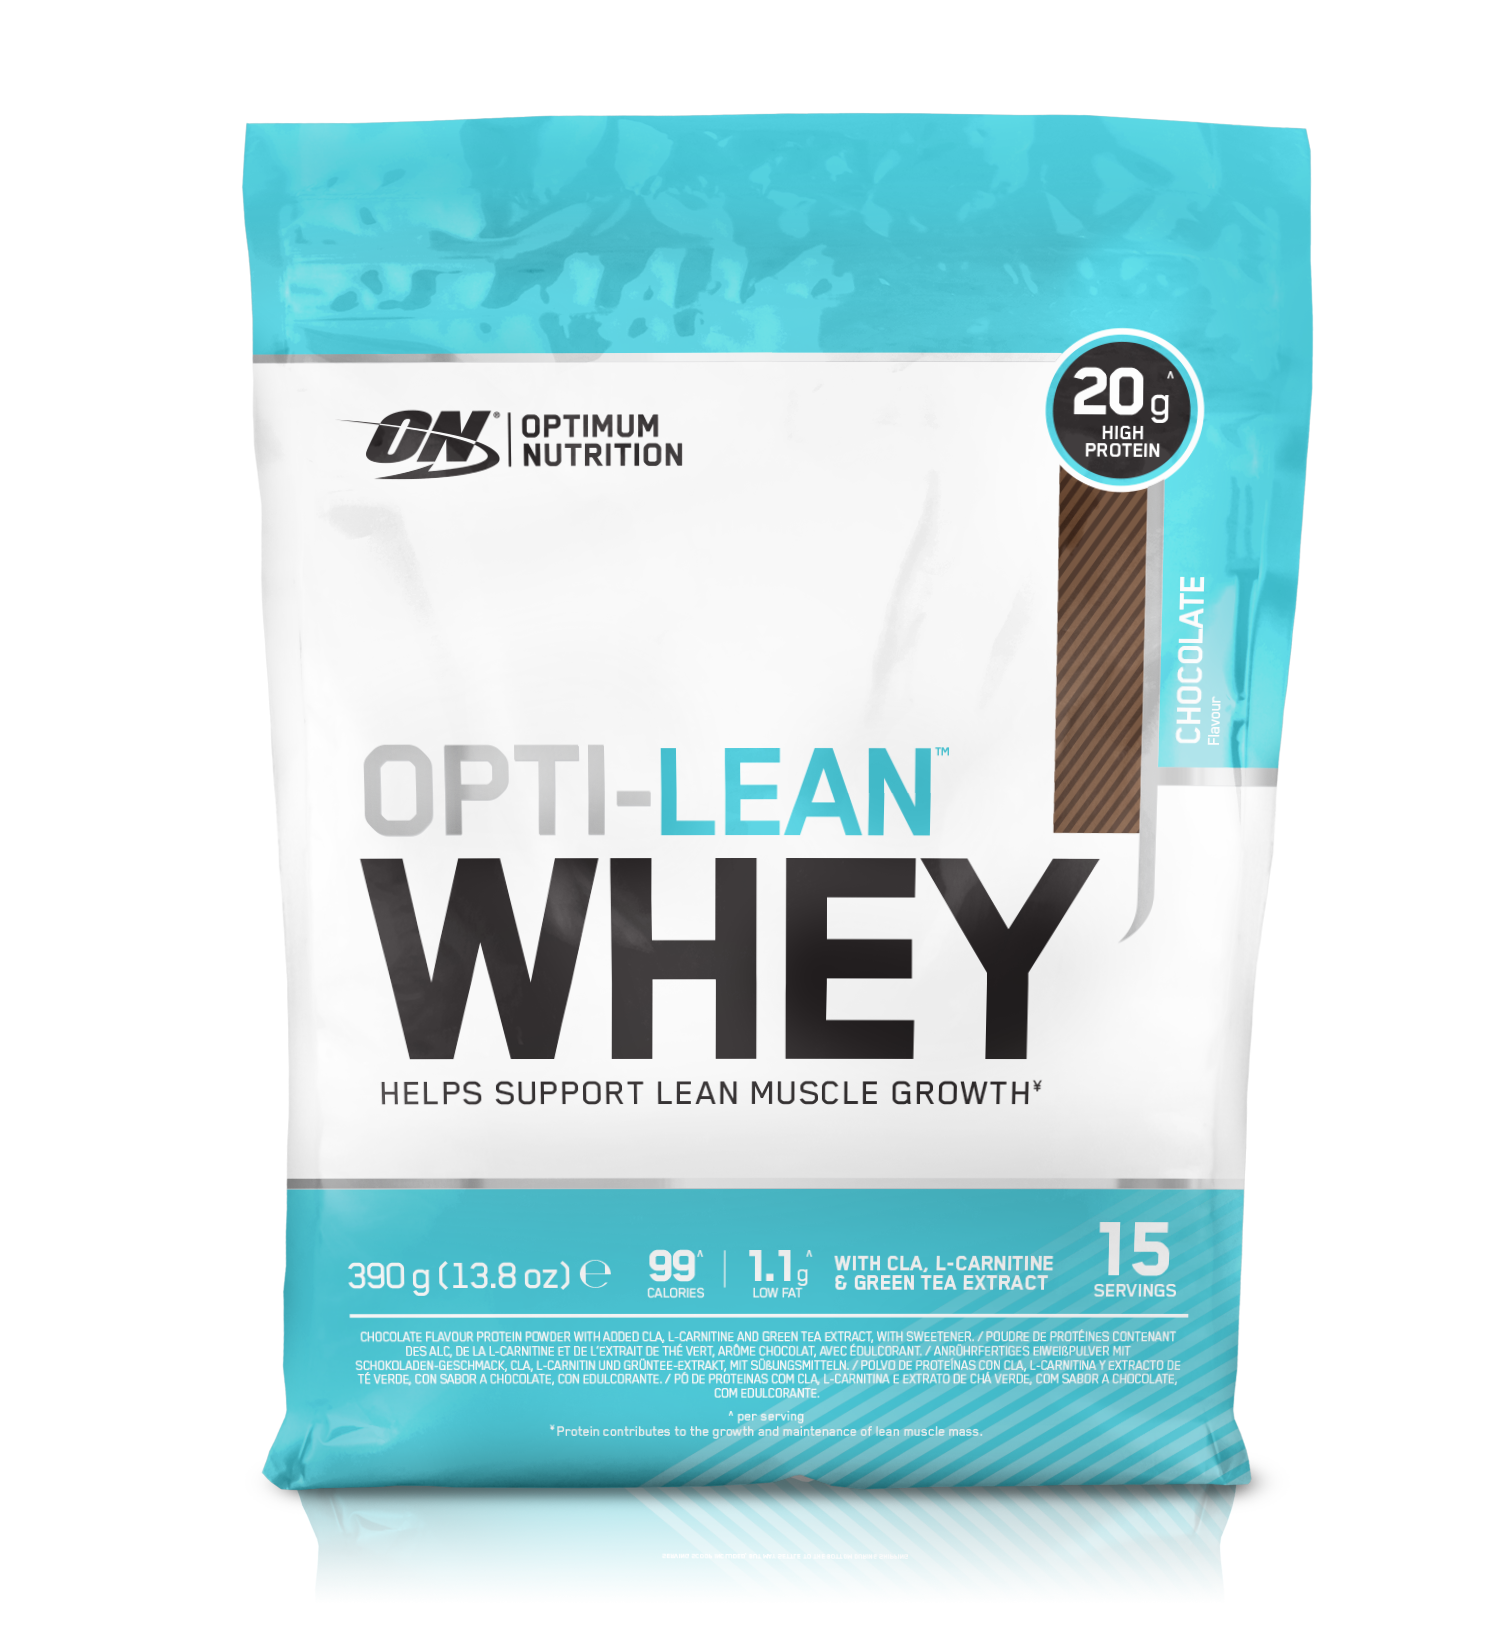 Optimum Nutrition Opti-Lean Whey 390g